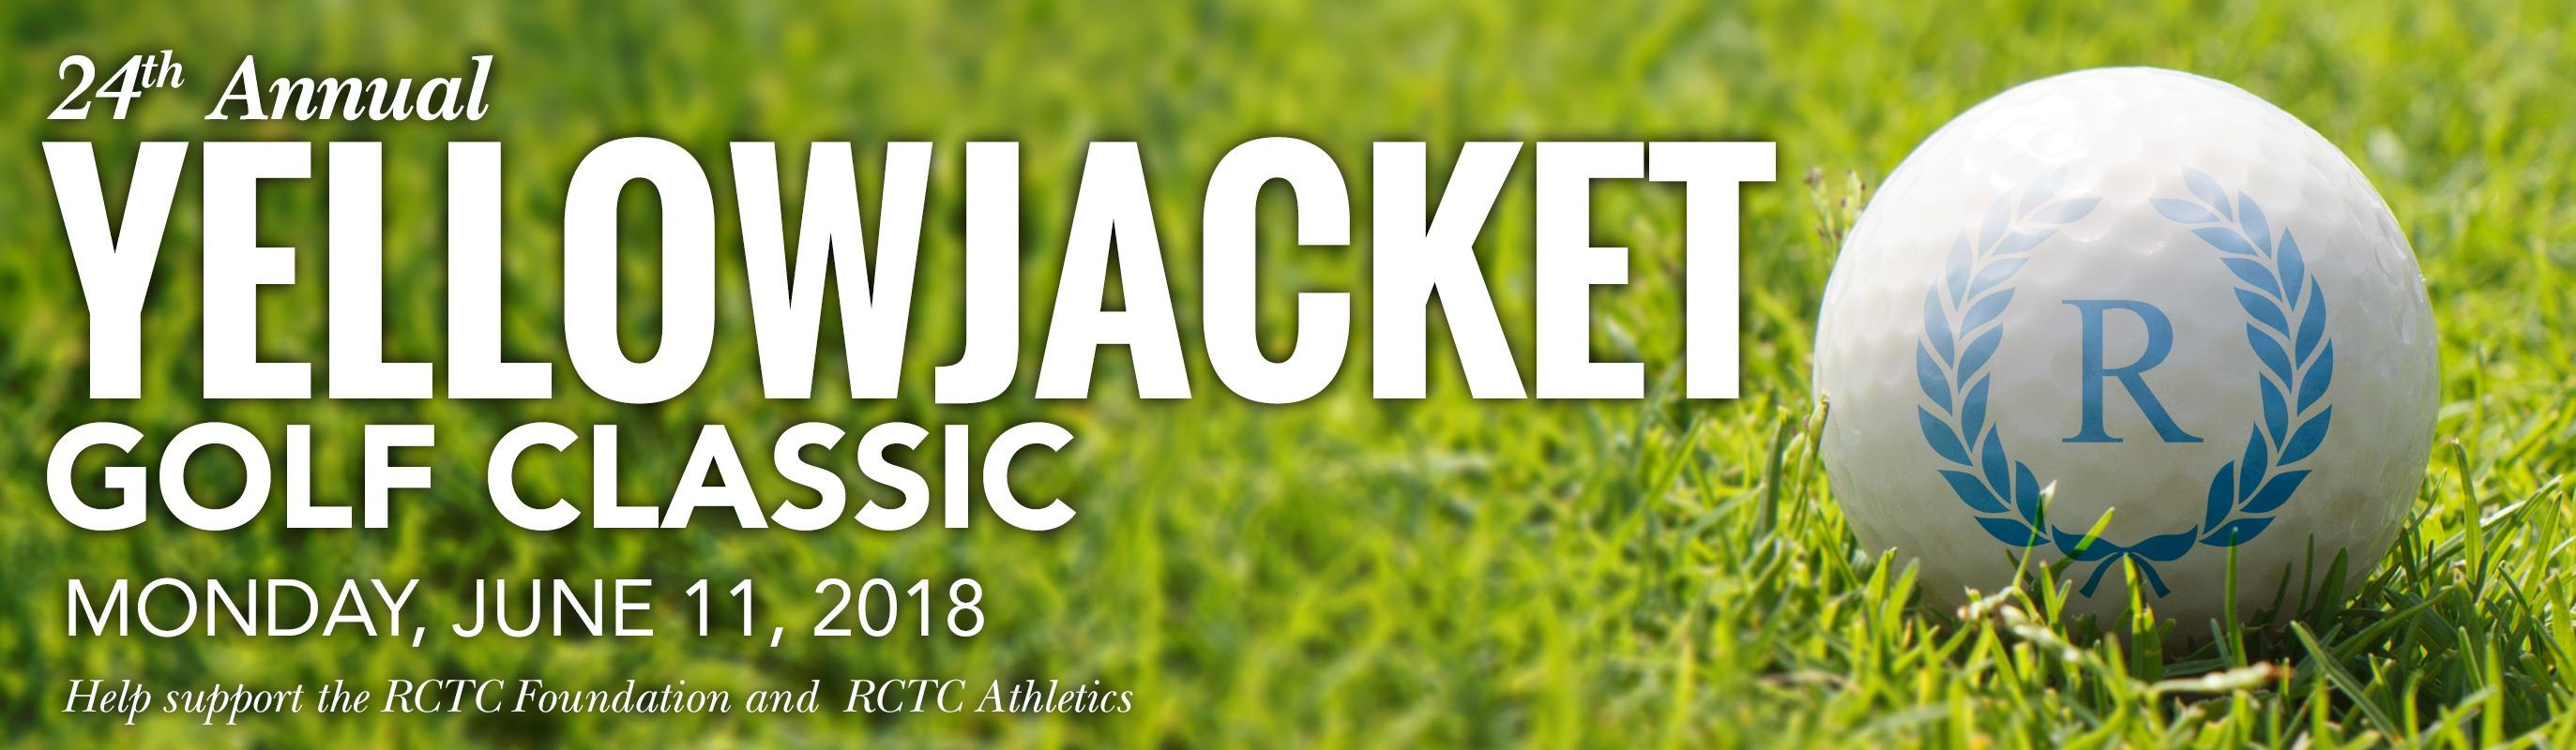 Yellowjacket Golf Classic